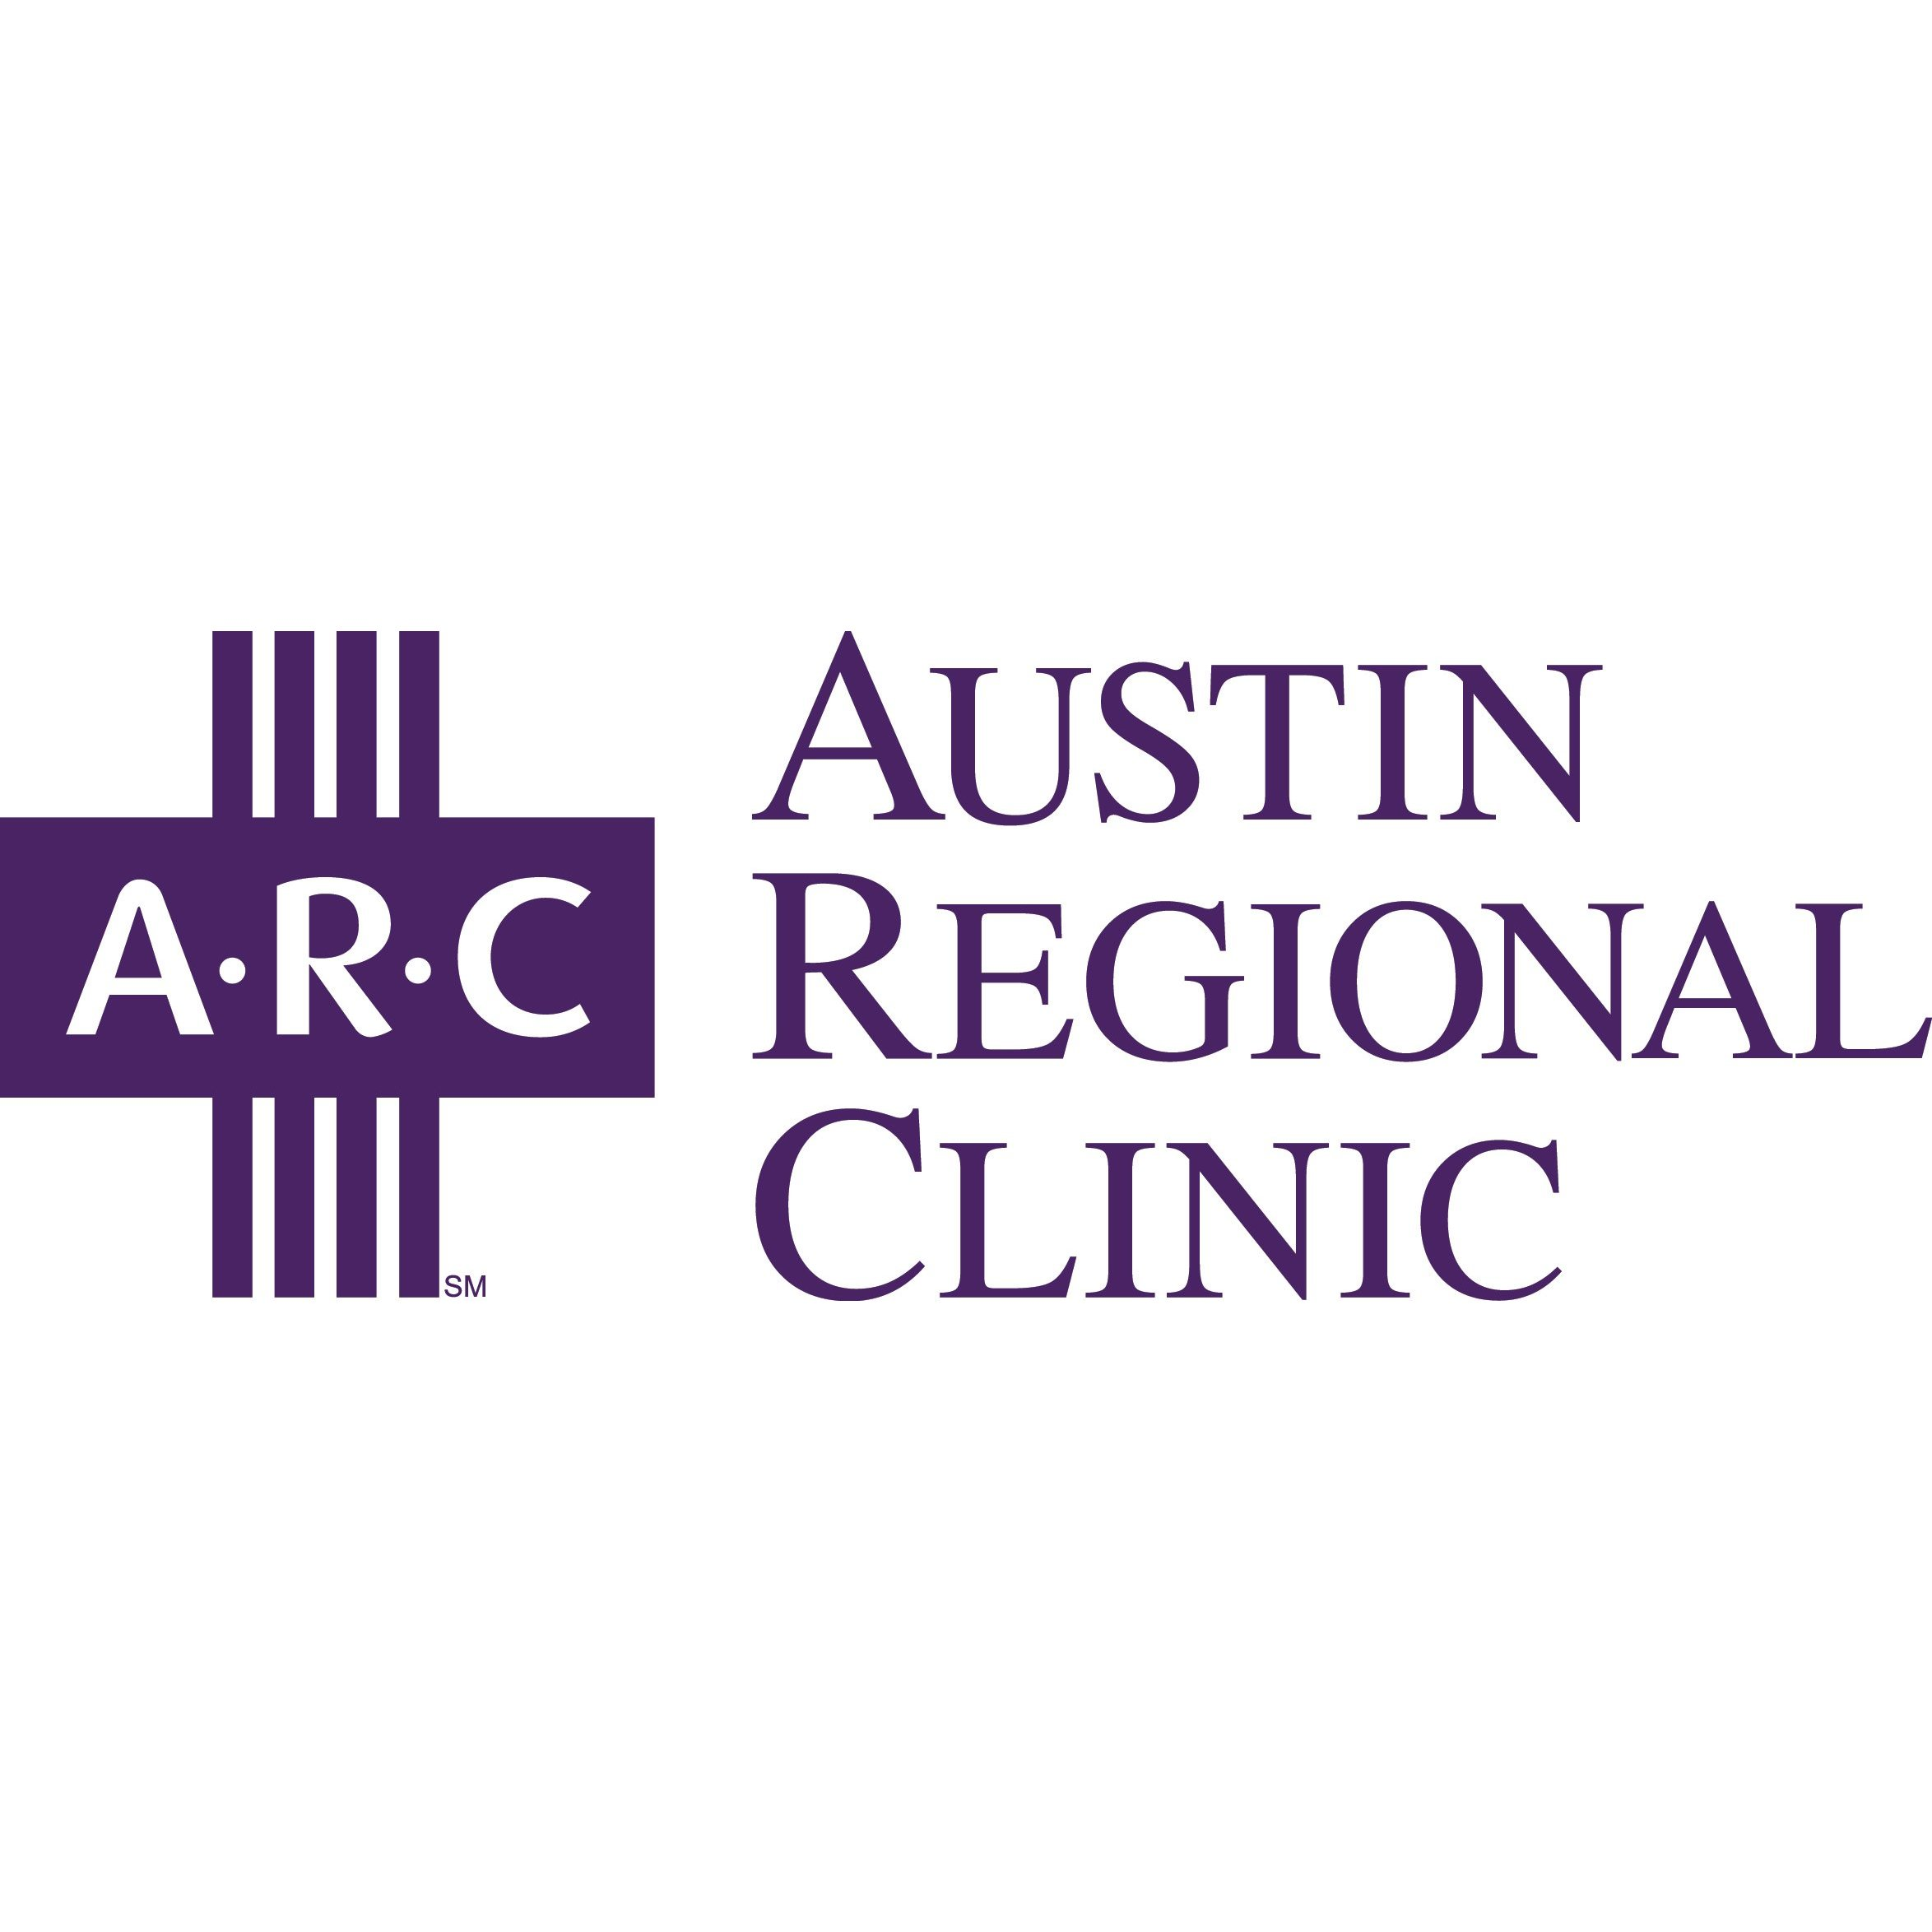 Austin Regional Clinic: ARC Southwest Logo